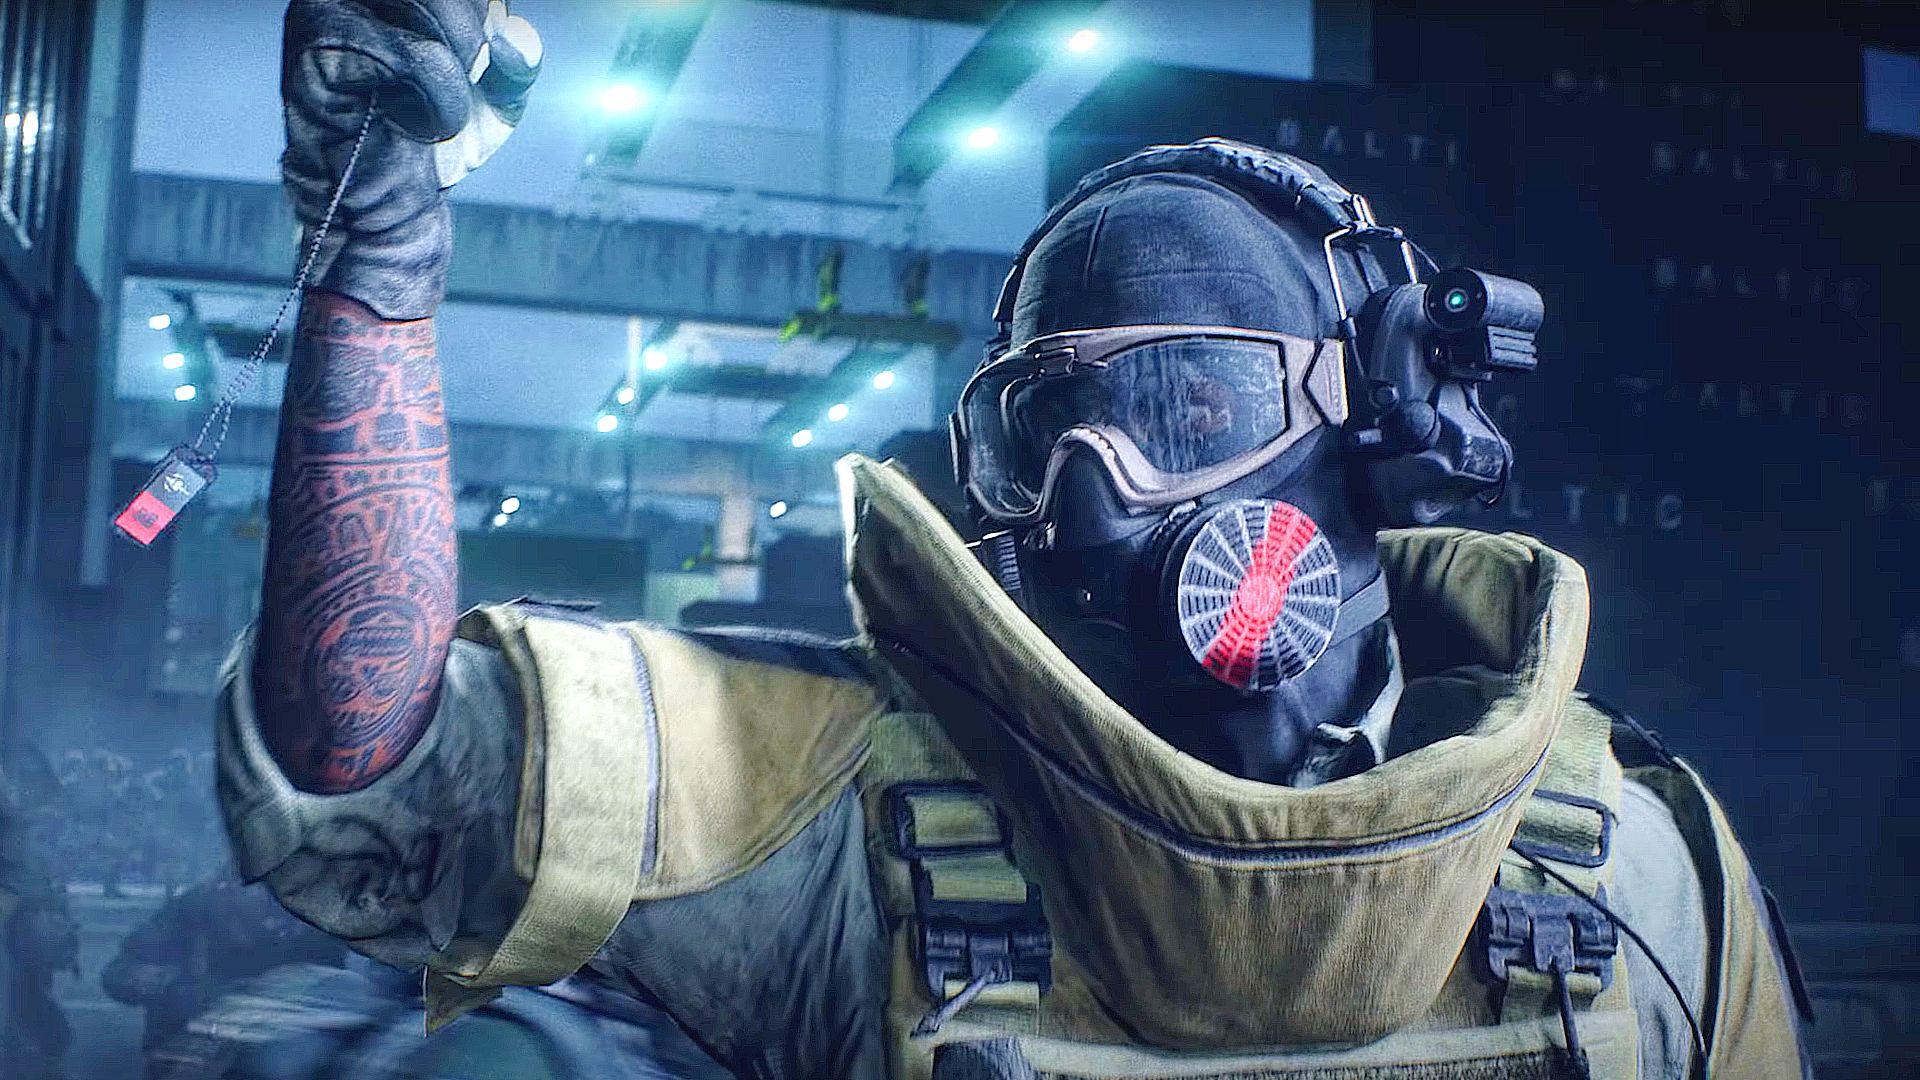 Battlefield 2042 reveal trailer – 23 cool details we spotted